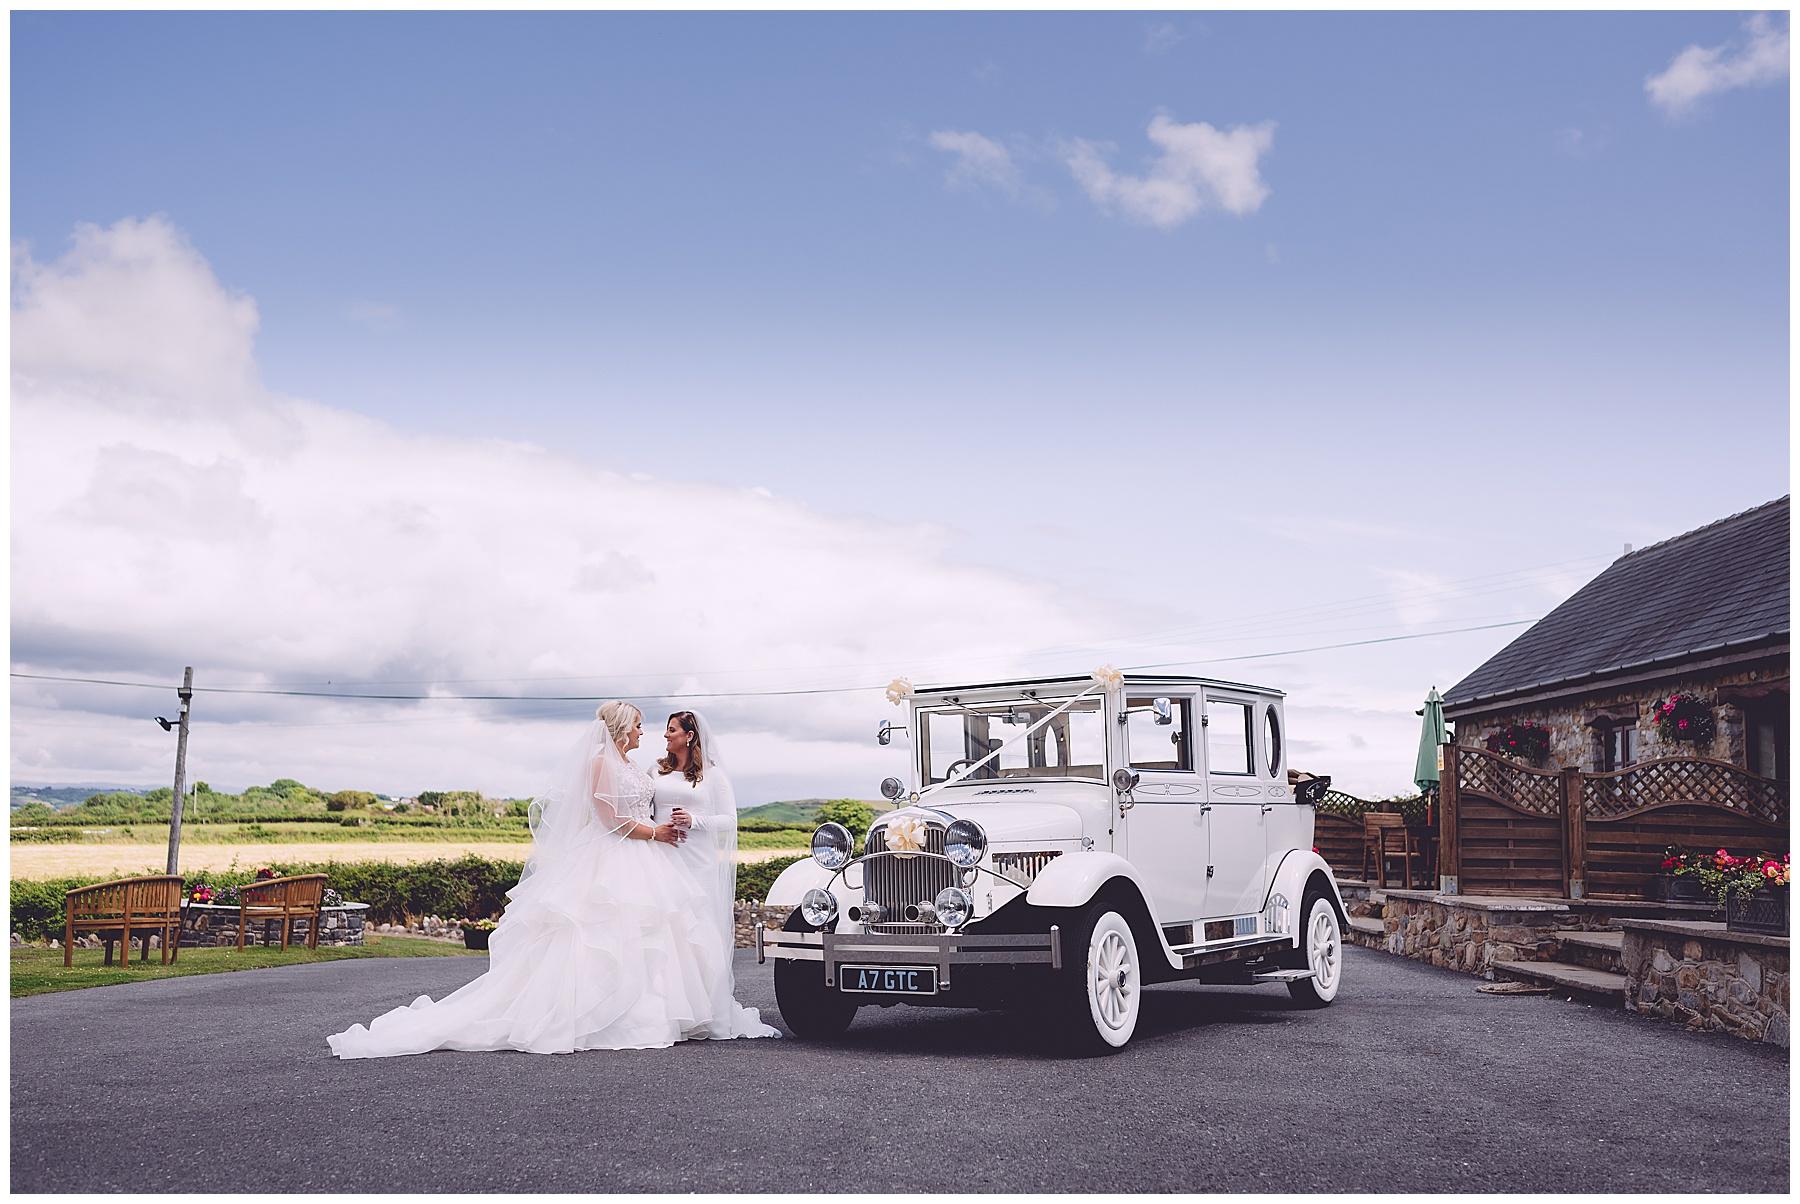 Wedding Car at Ocean View Gower Wedding